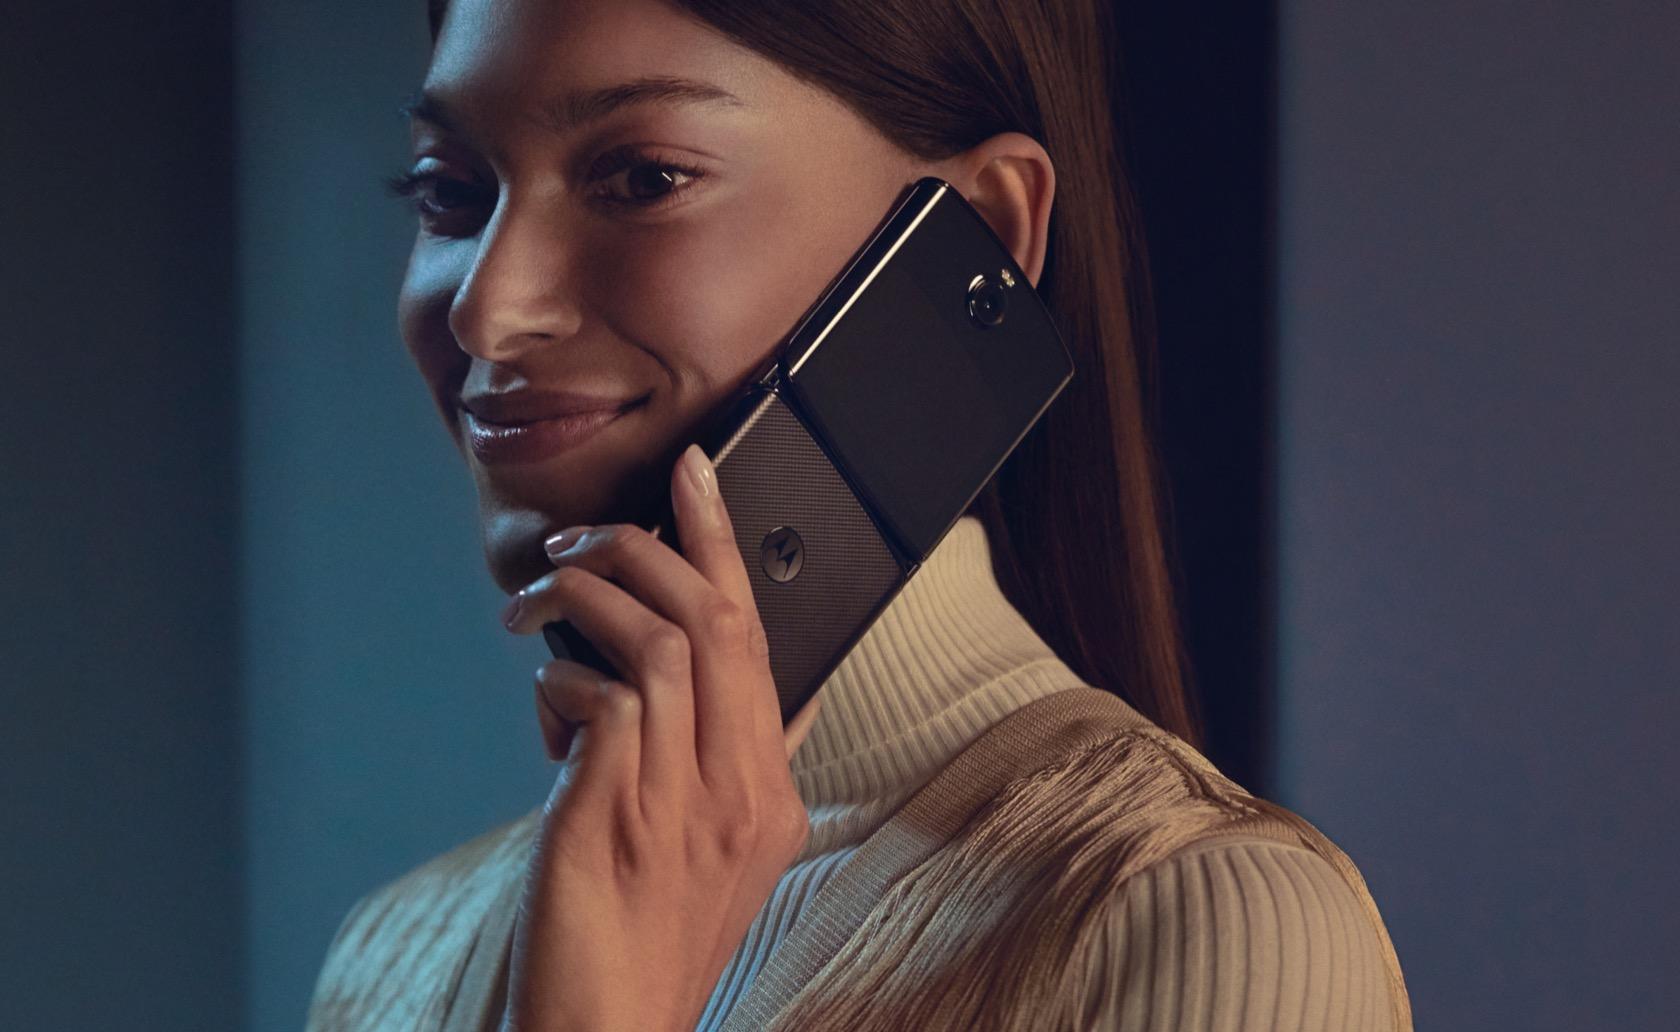 摩托罗拉Razr宣告重生 – 一台折叠屏Android手机的照片 - 6